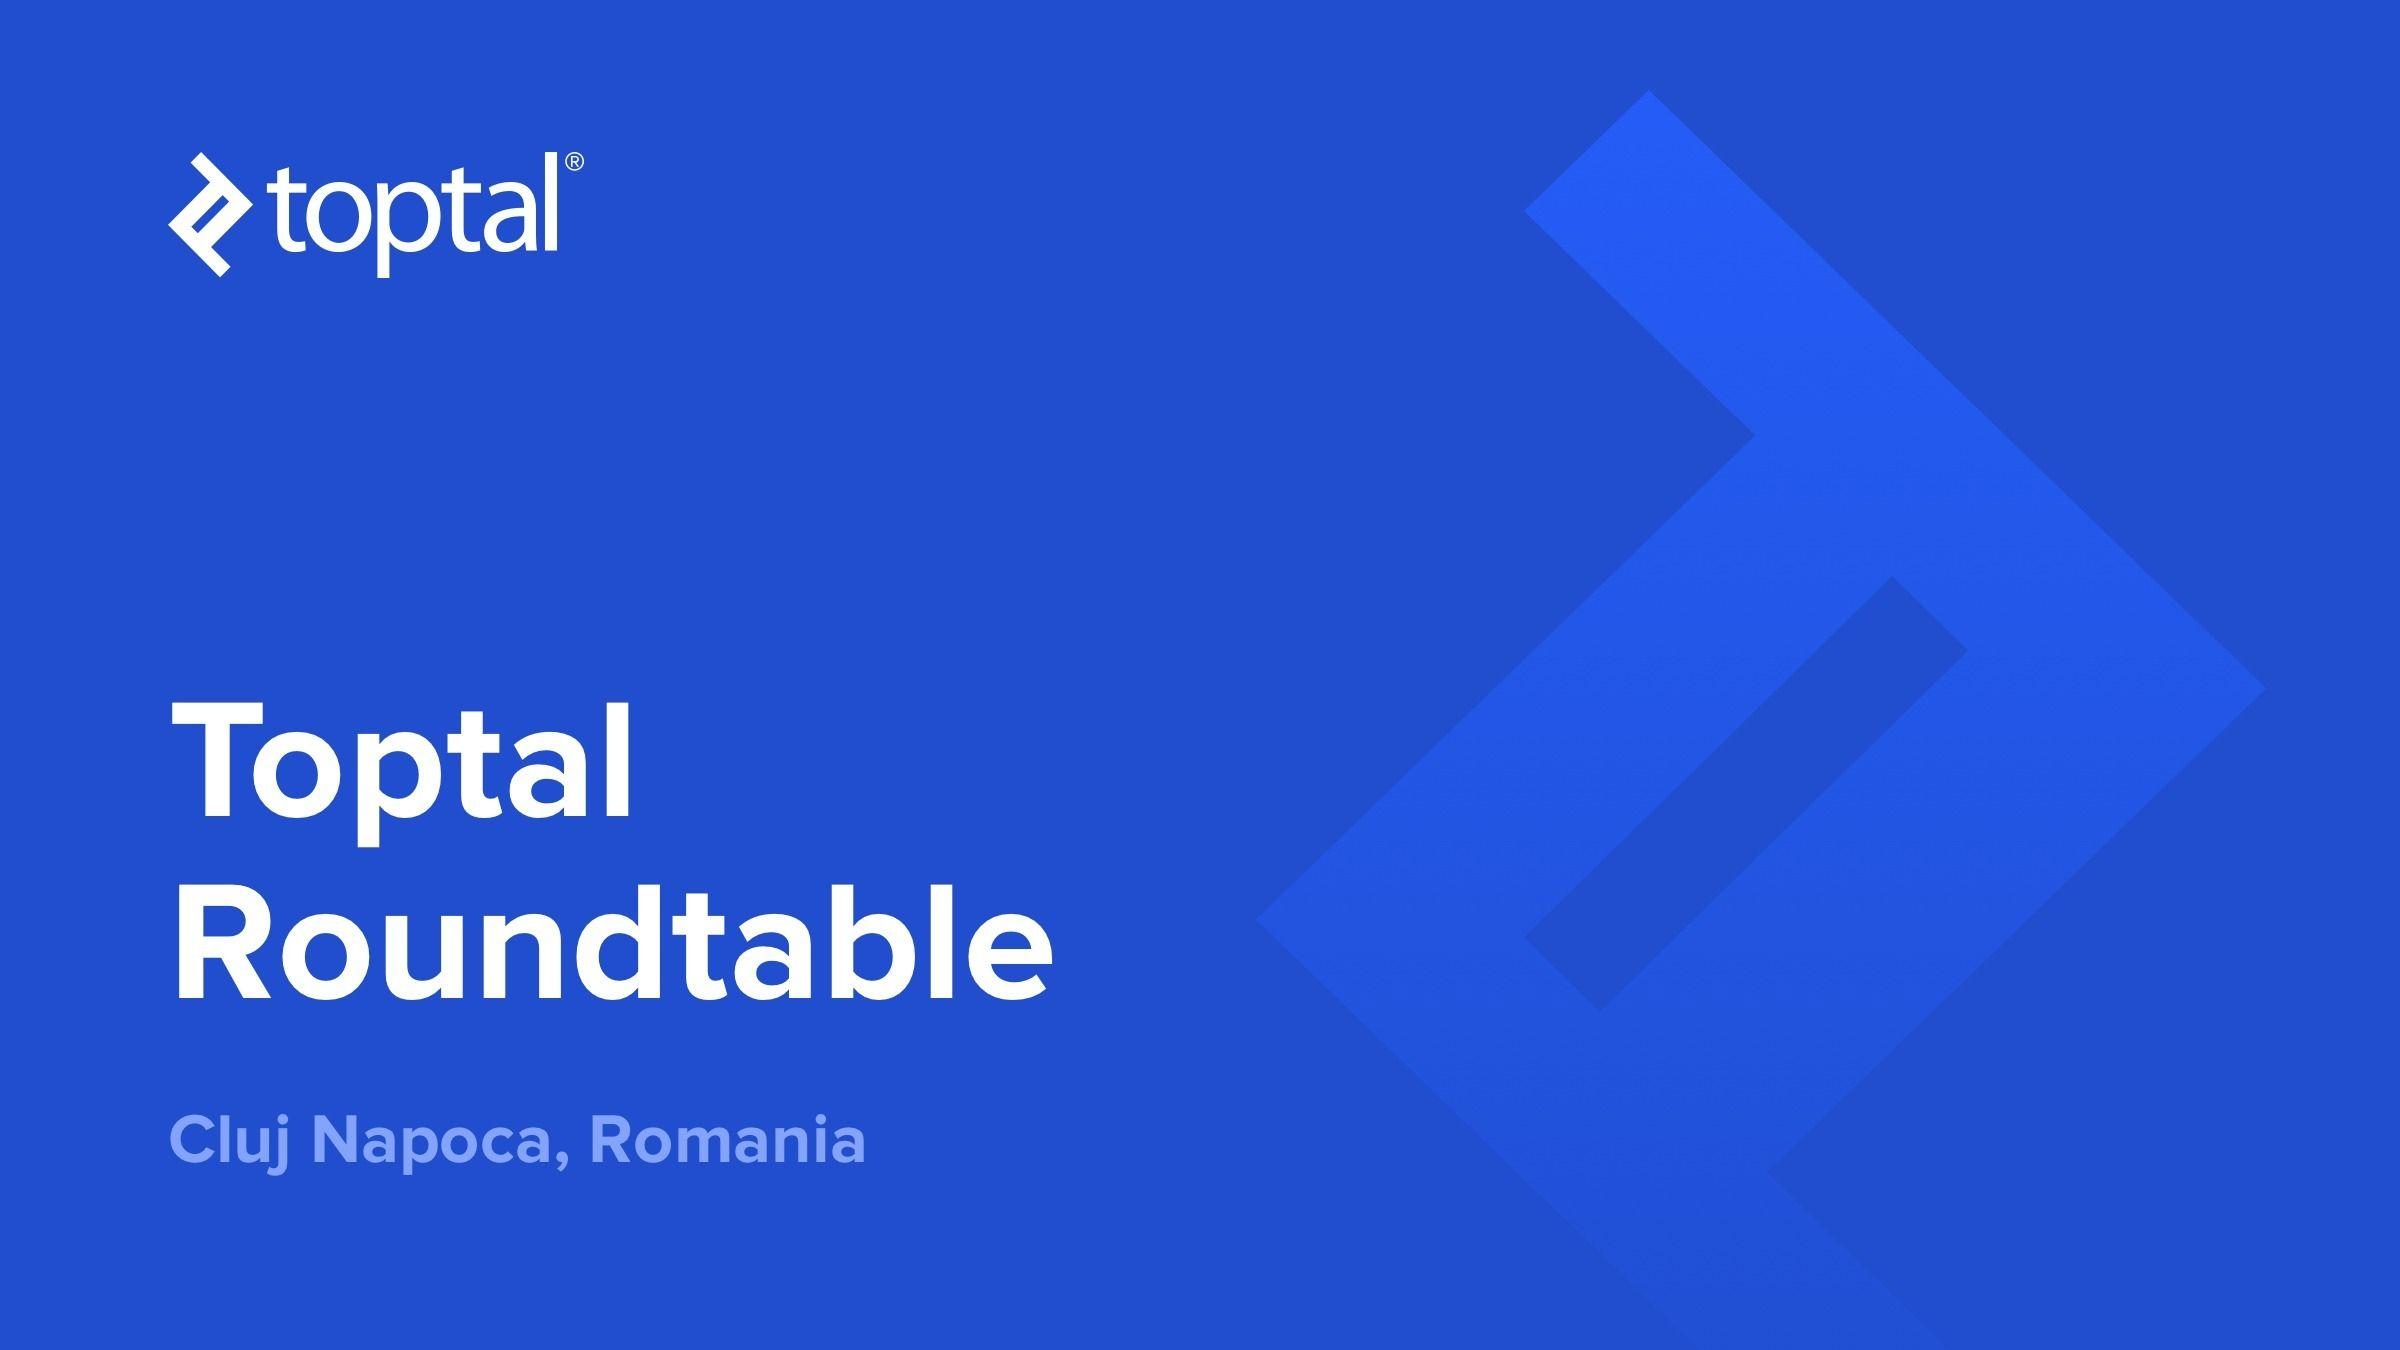 Toptal Roundtable Cluj Napoca